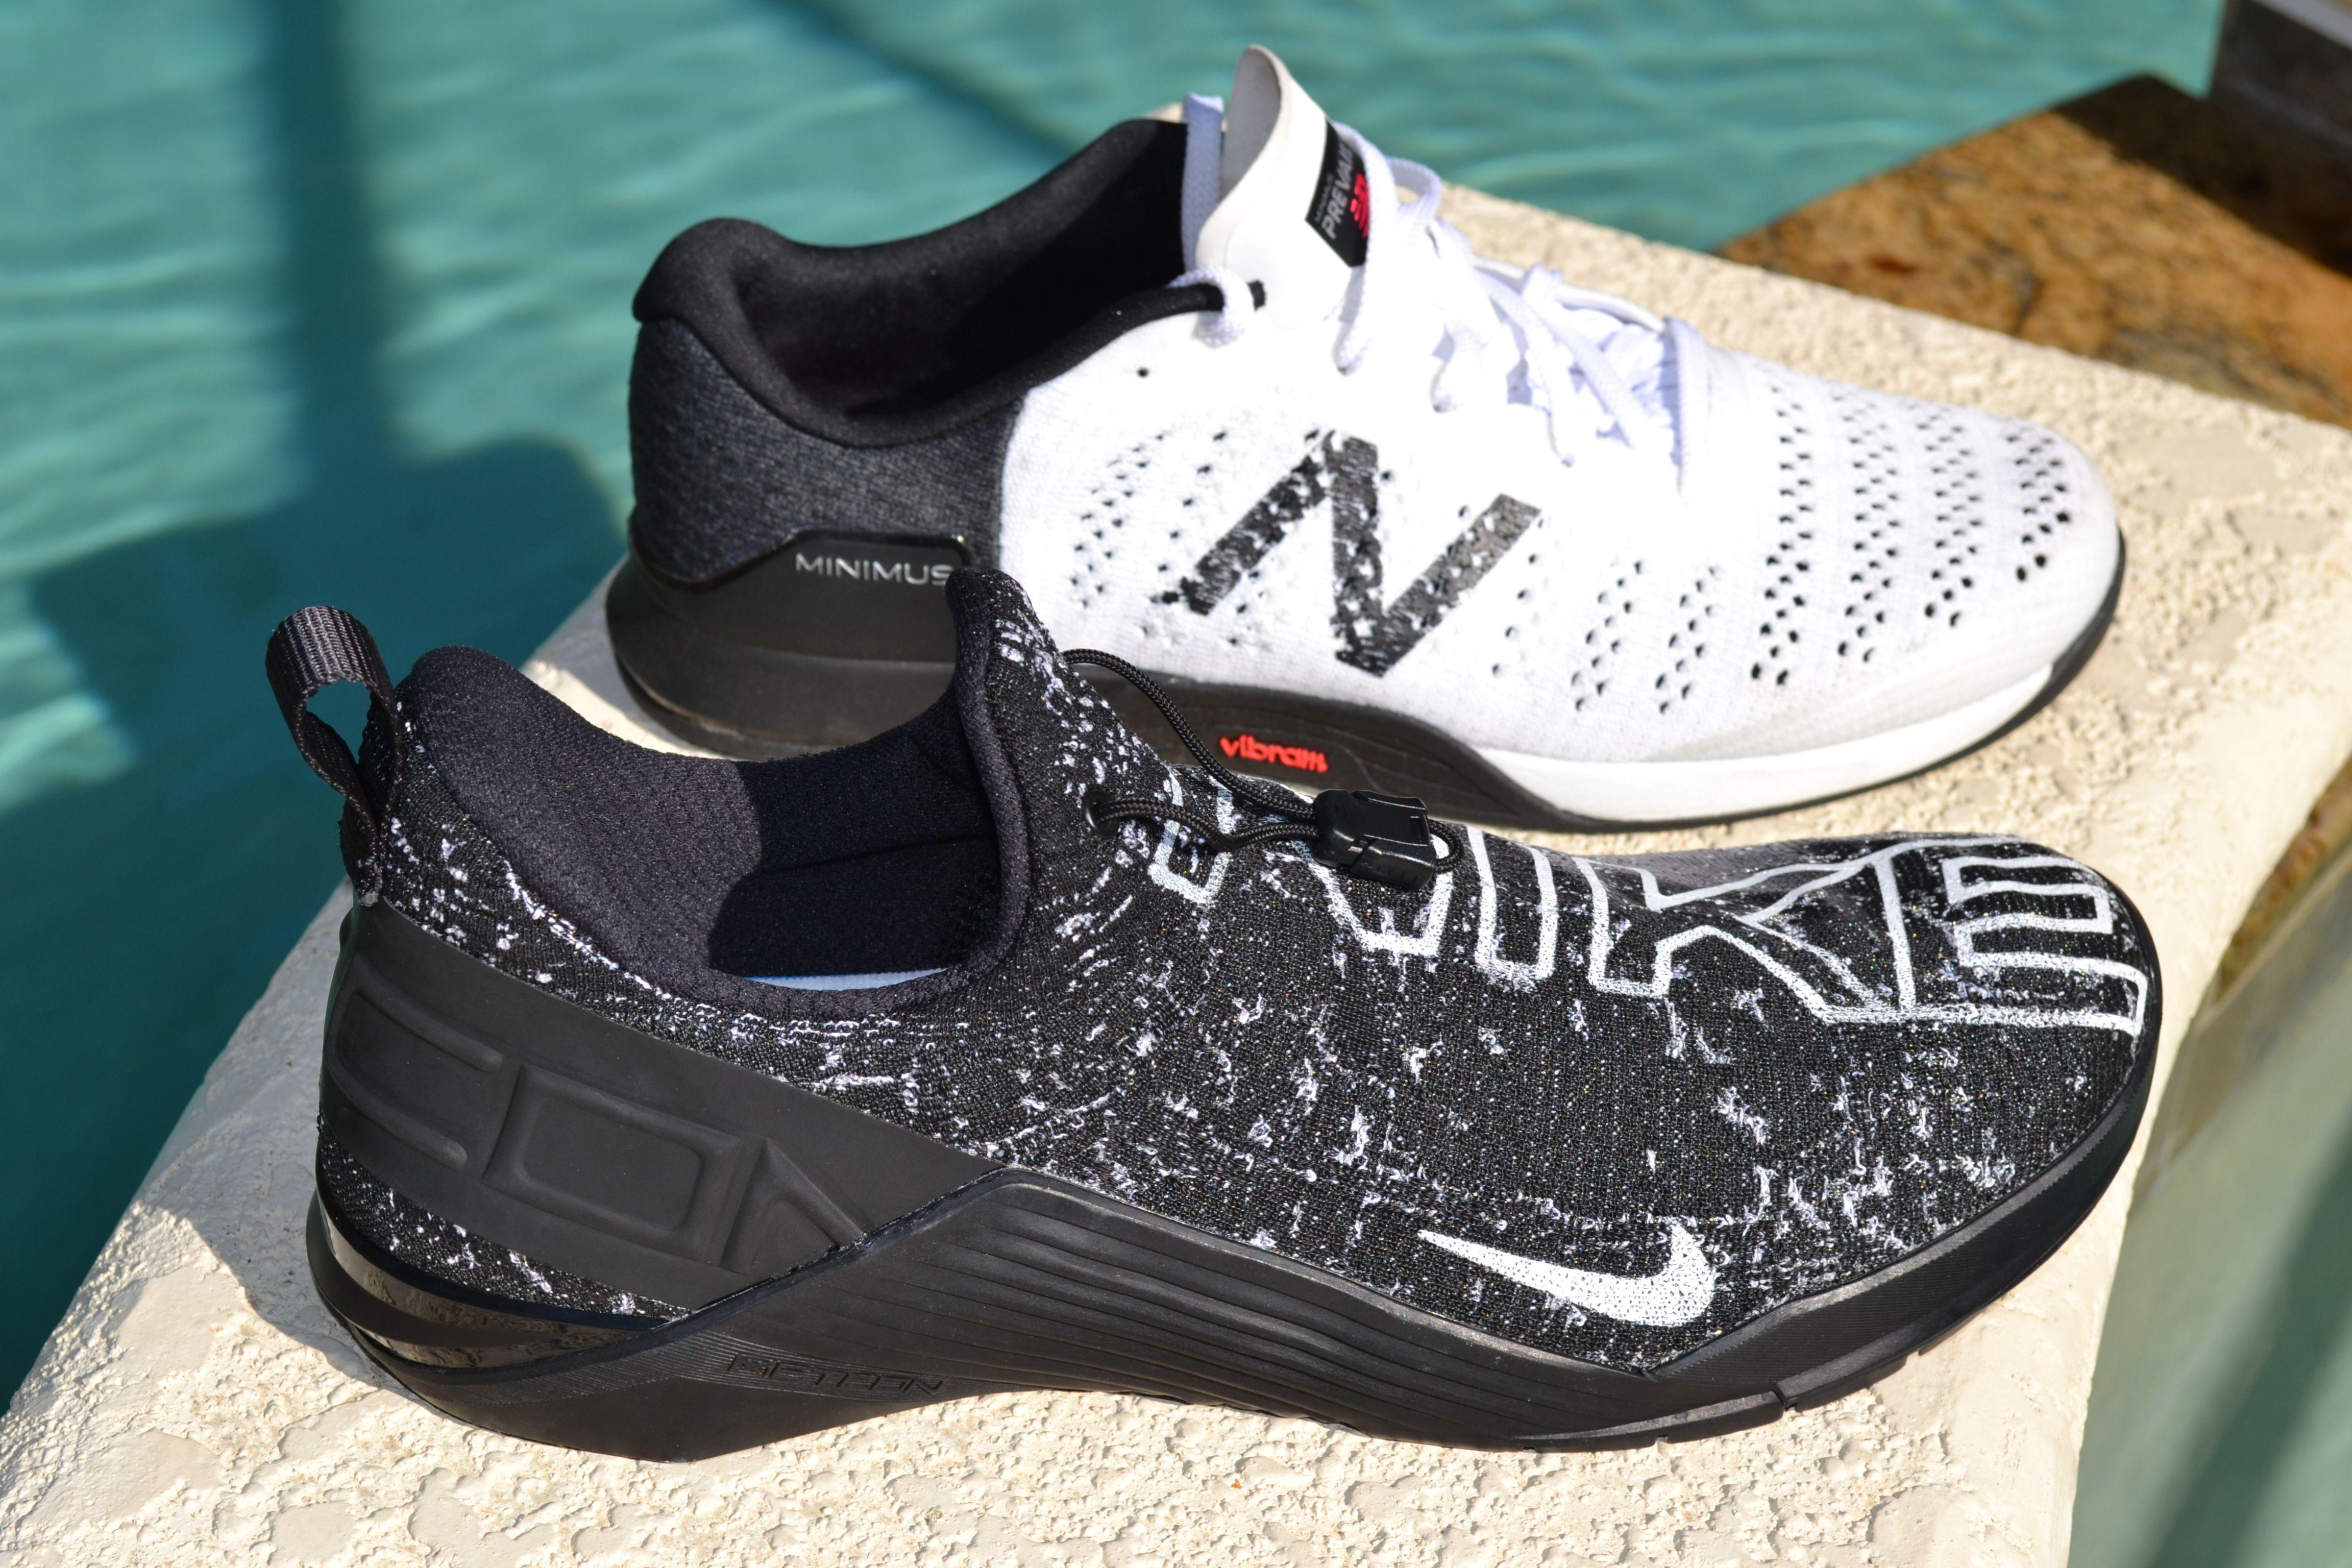 Civil Corrección ventana  Nike React Metcon training shoe for CrossFit - React Foam + Metcon features    Crossfit shoes, Free running shoes, Nike